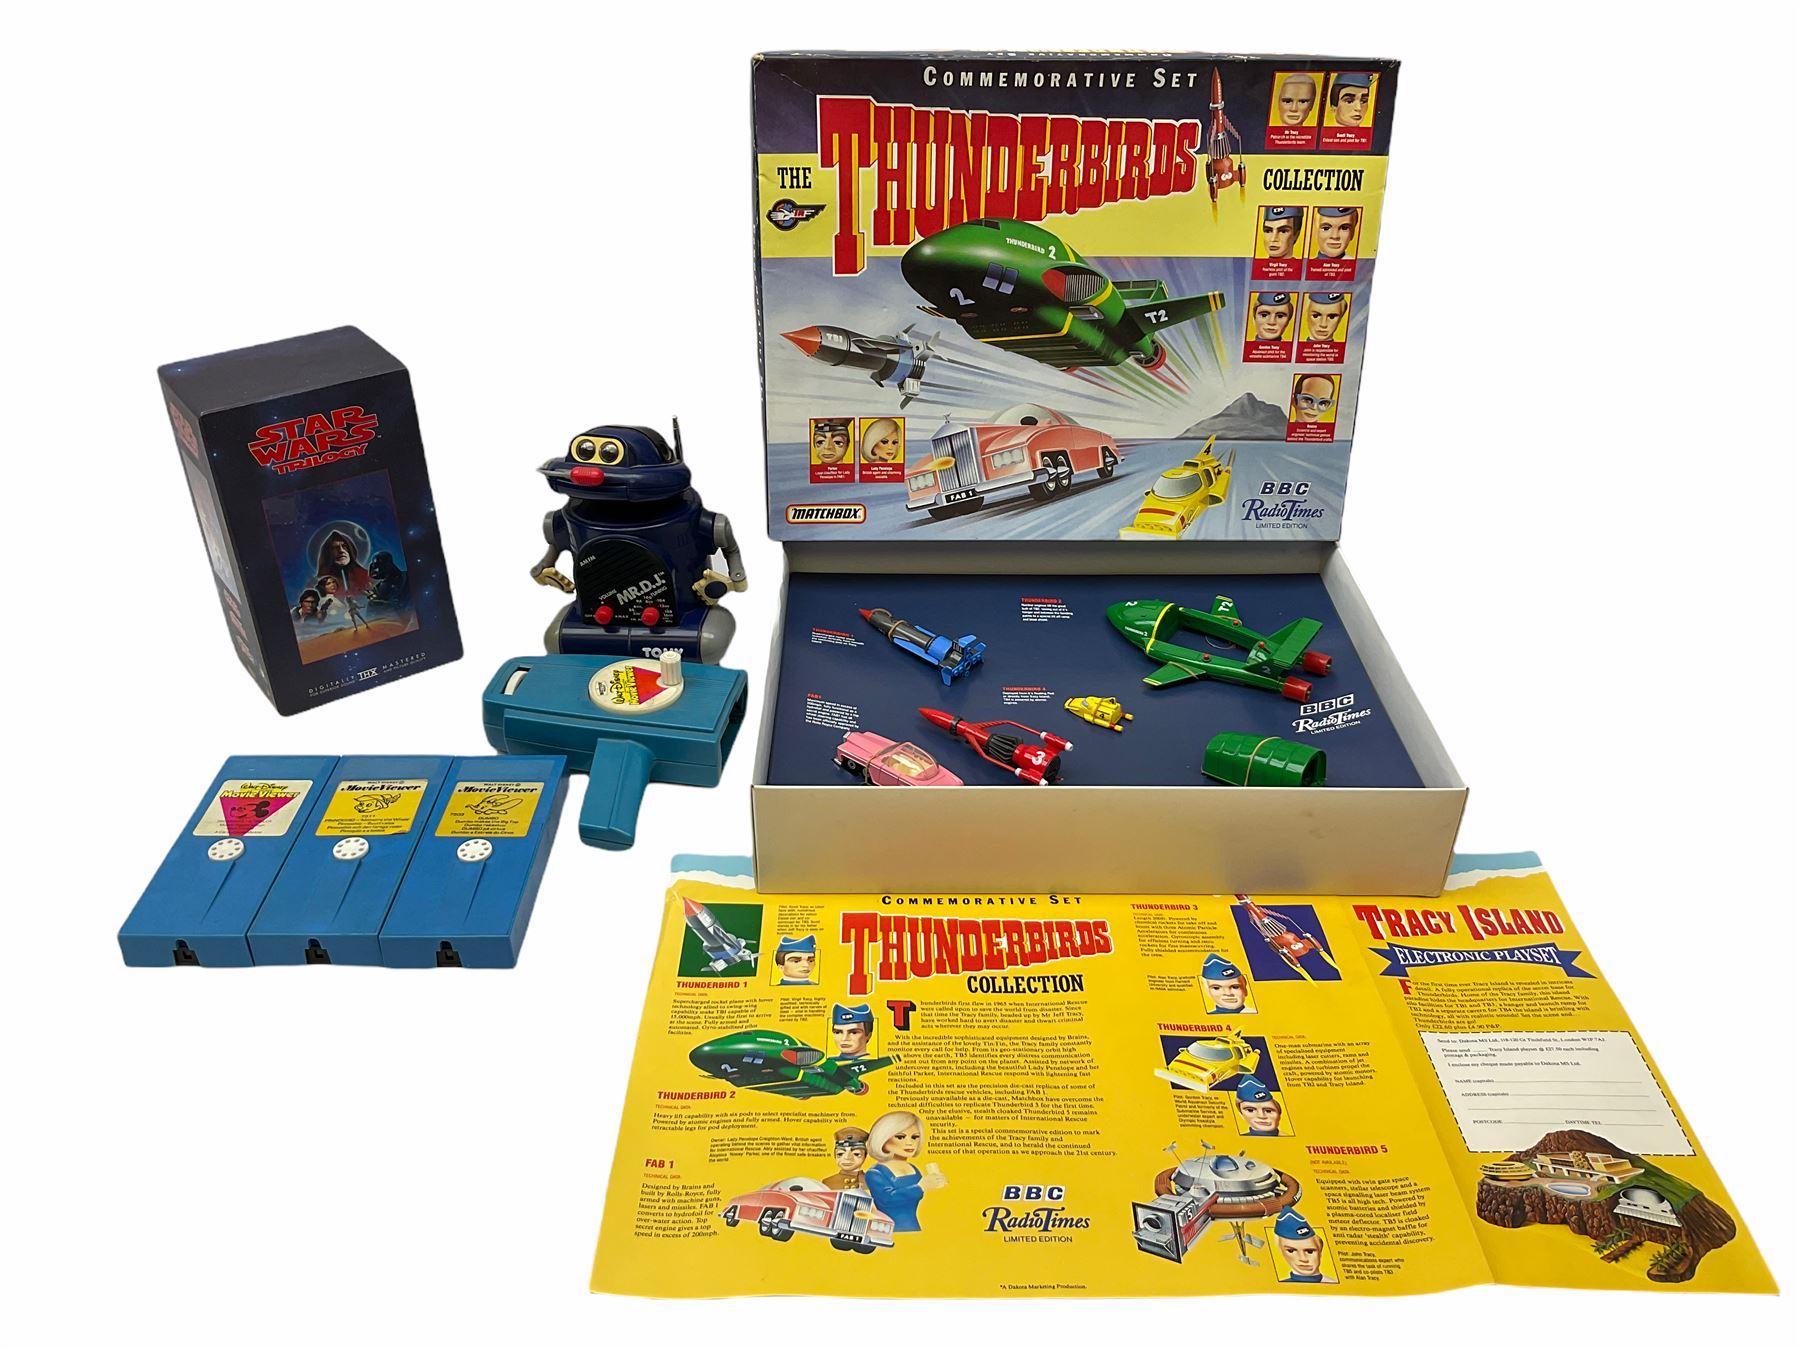 Matchbox 'The Thunderbirds' limited edition Commemorative Set